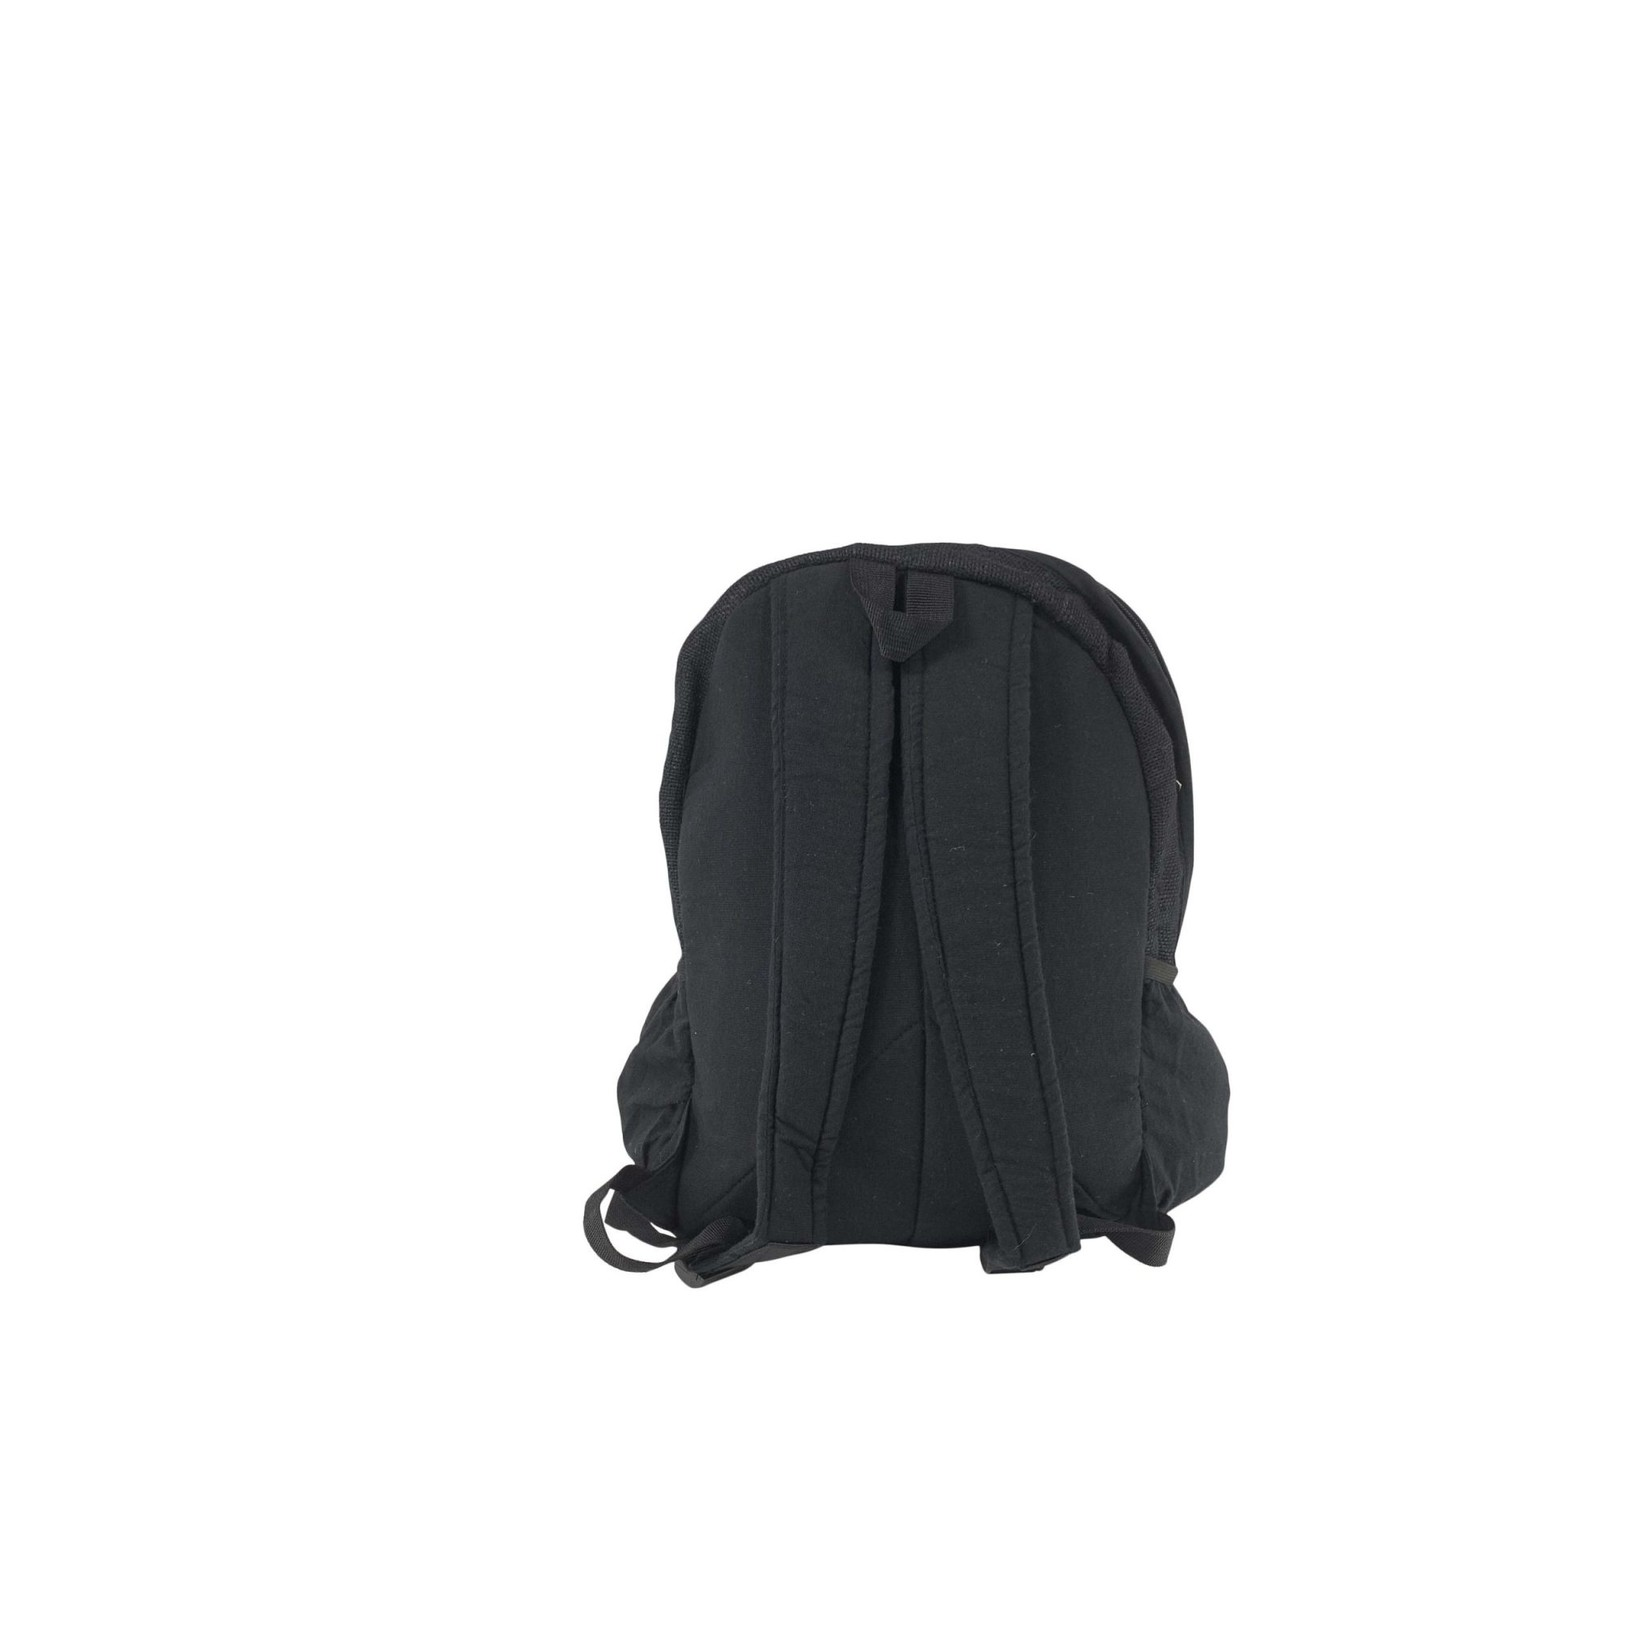 Hempy's Hempys Executive Backpack Black